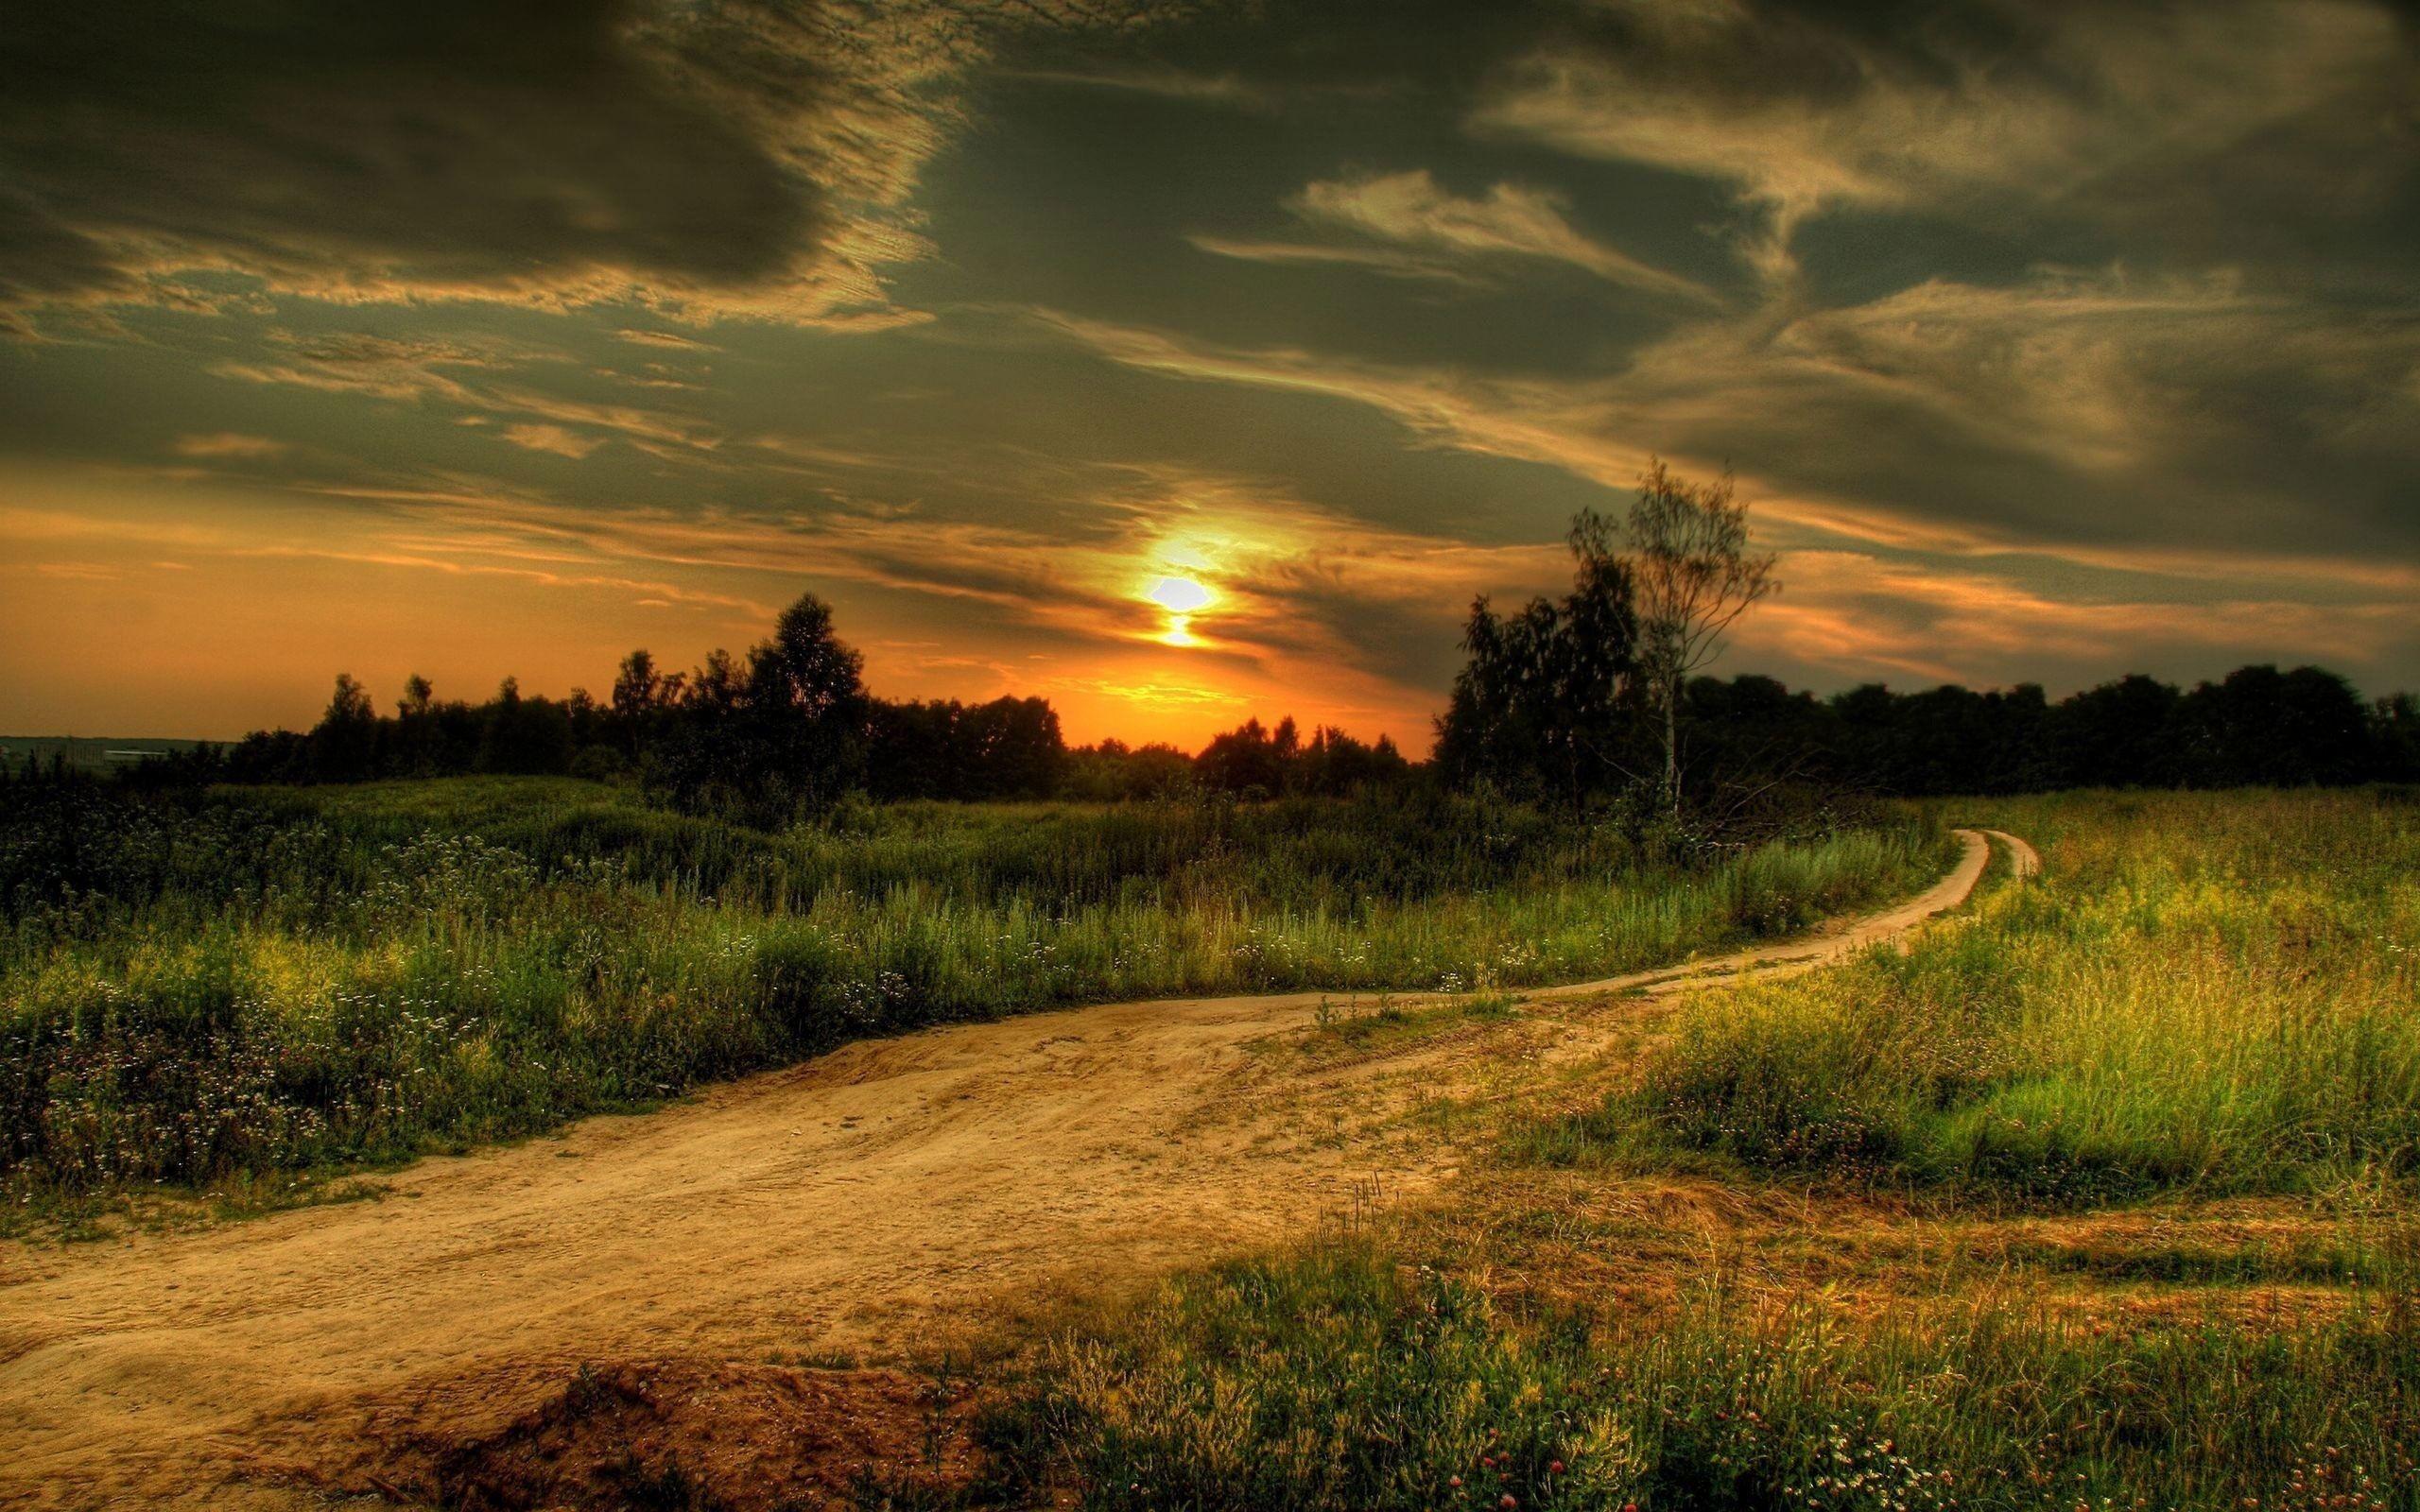 Road Western Image.